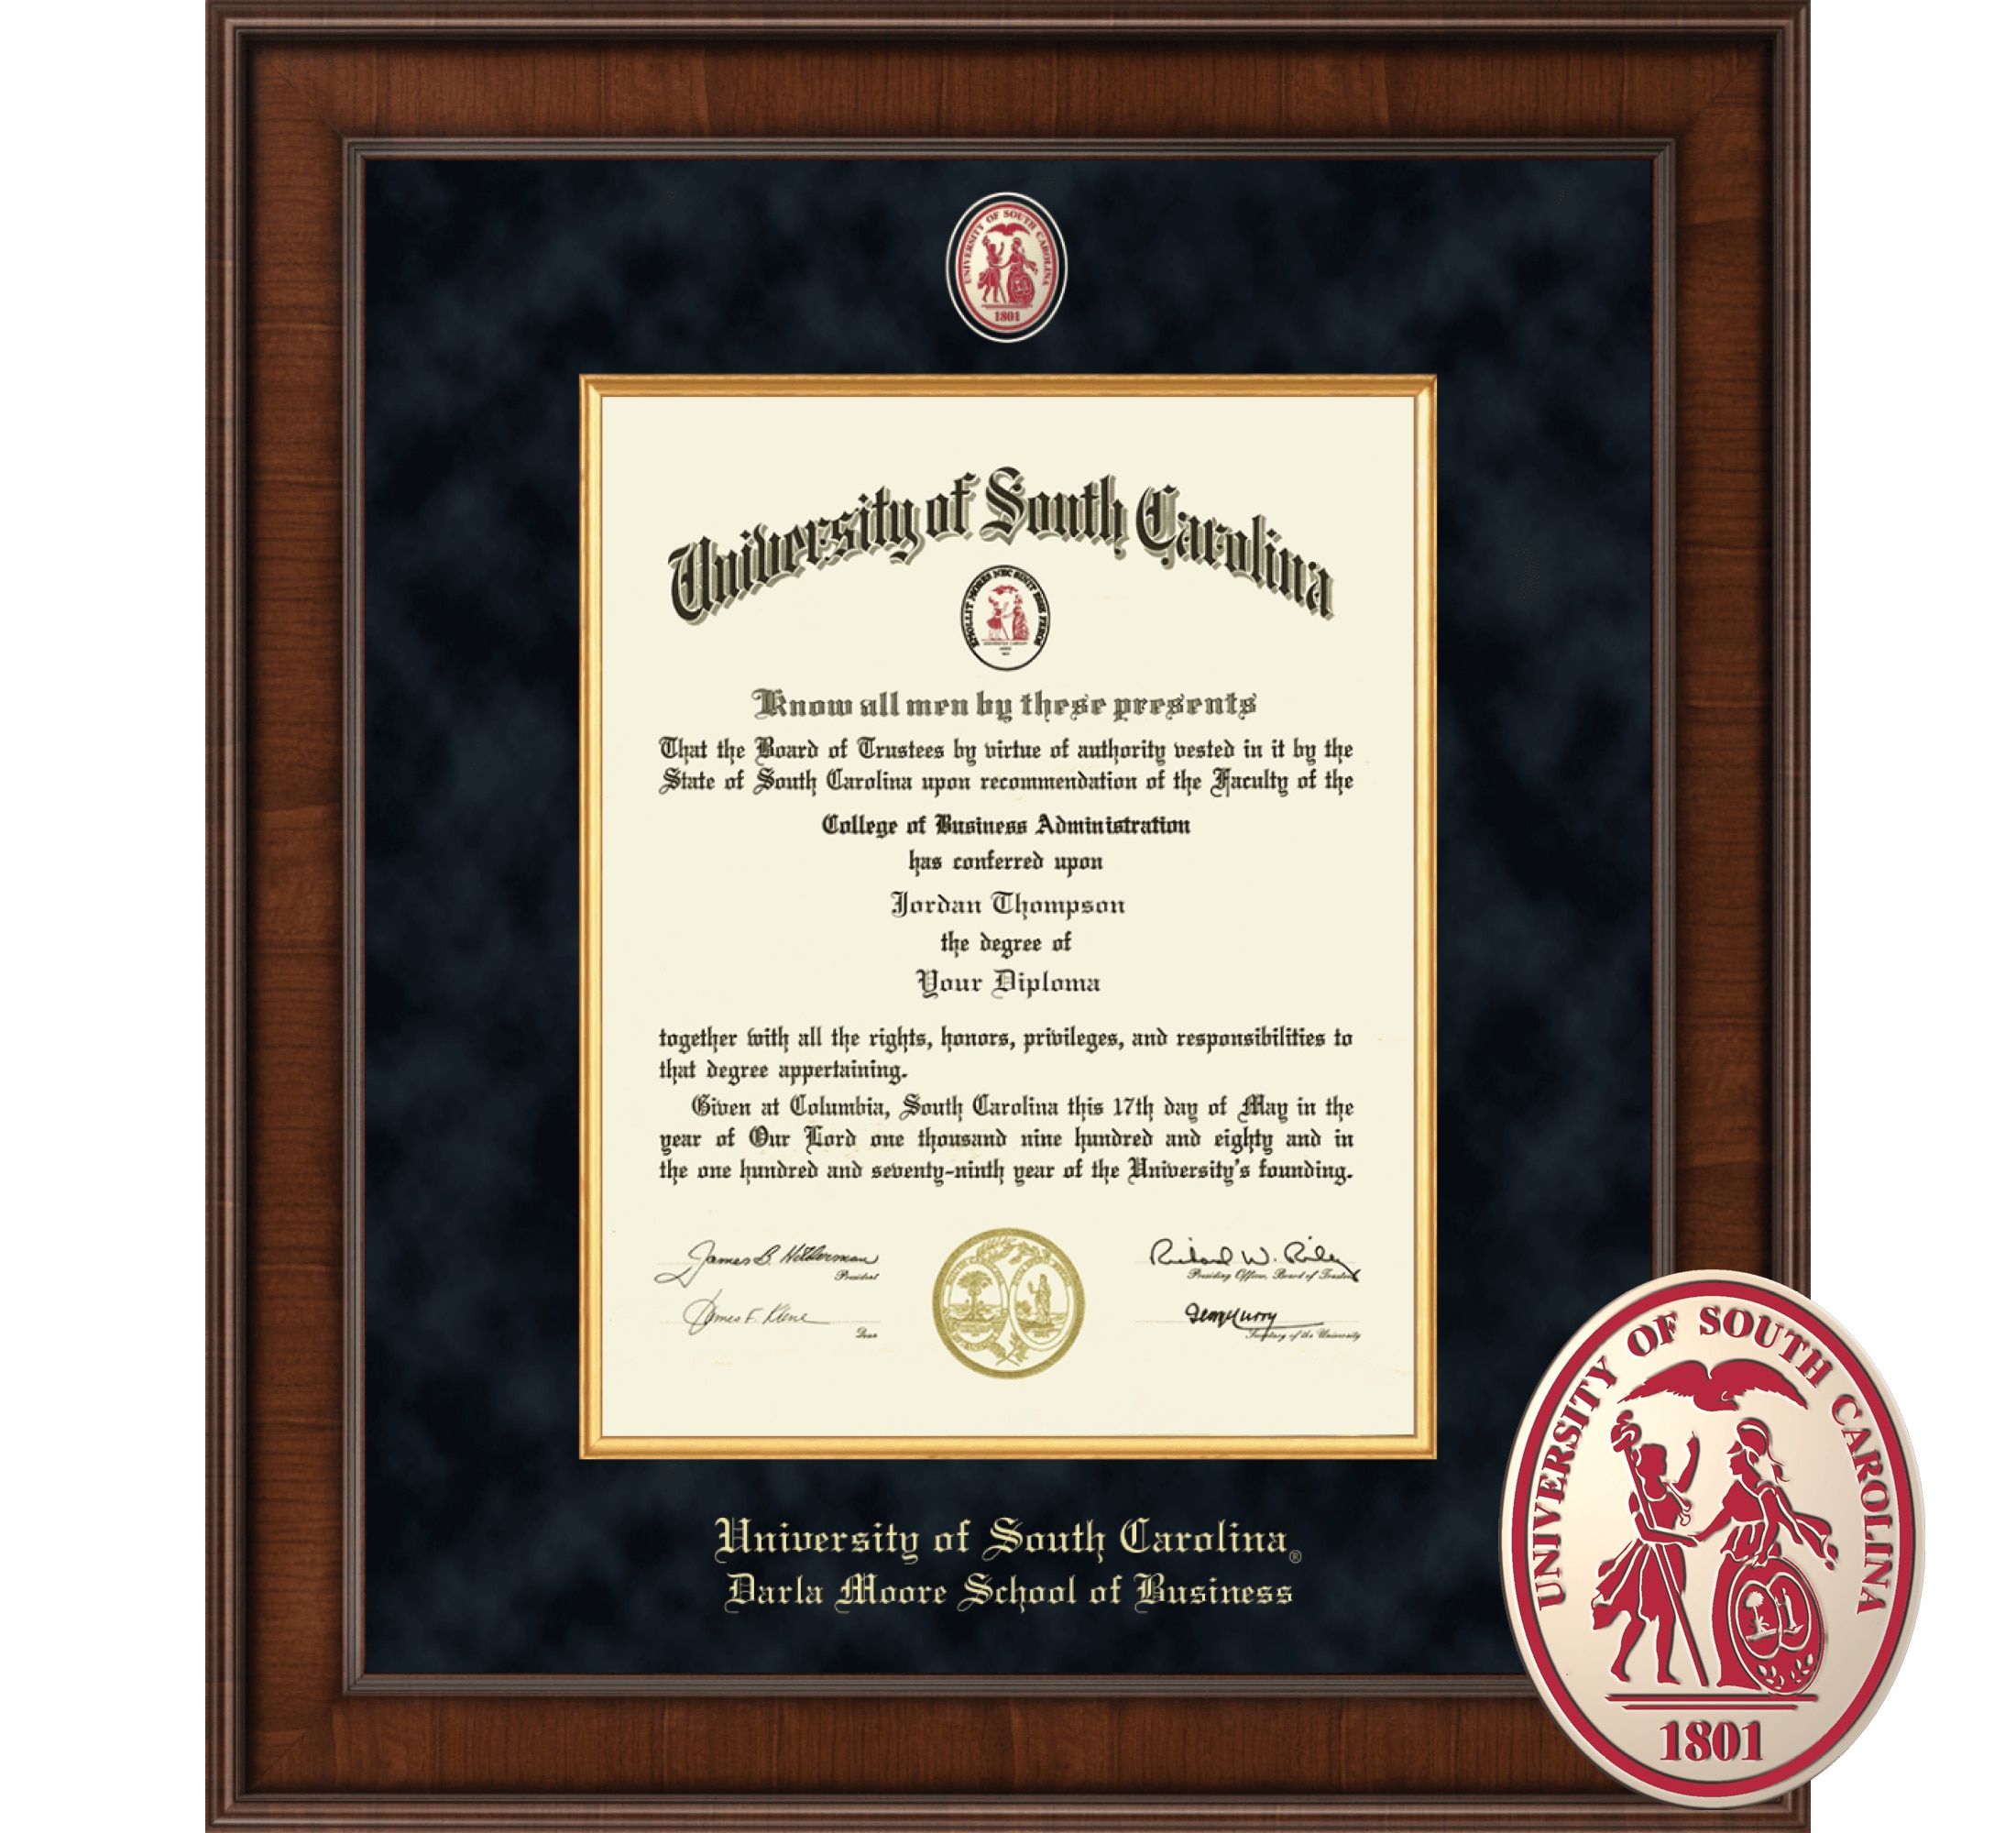 "Church Hill Classics 14"" x 11"" Presidential Walnut Darla Moore School of Business Diploma Frame"